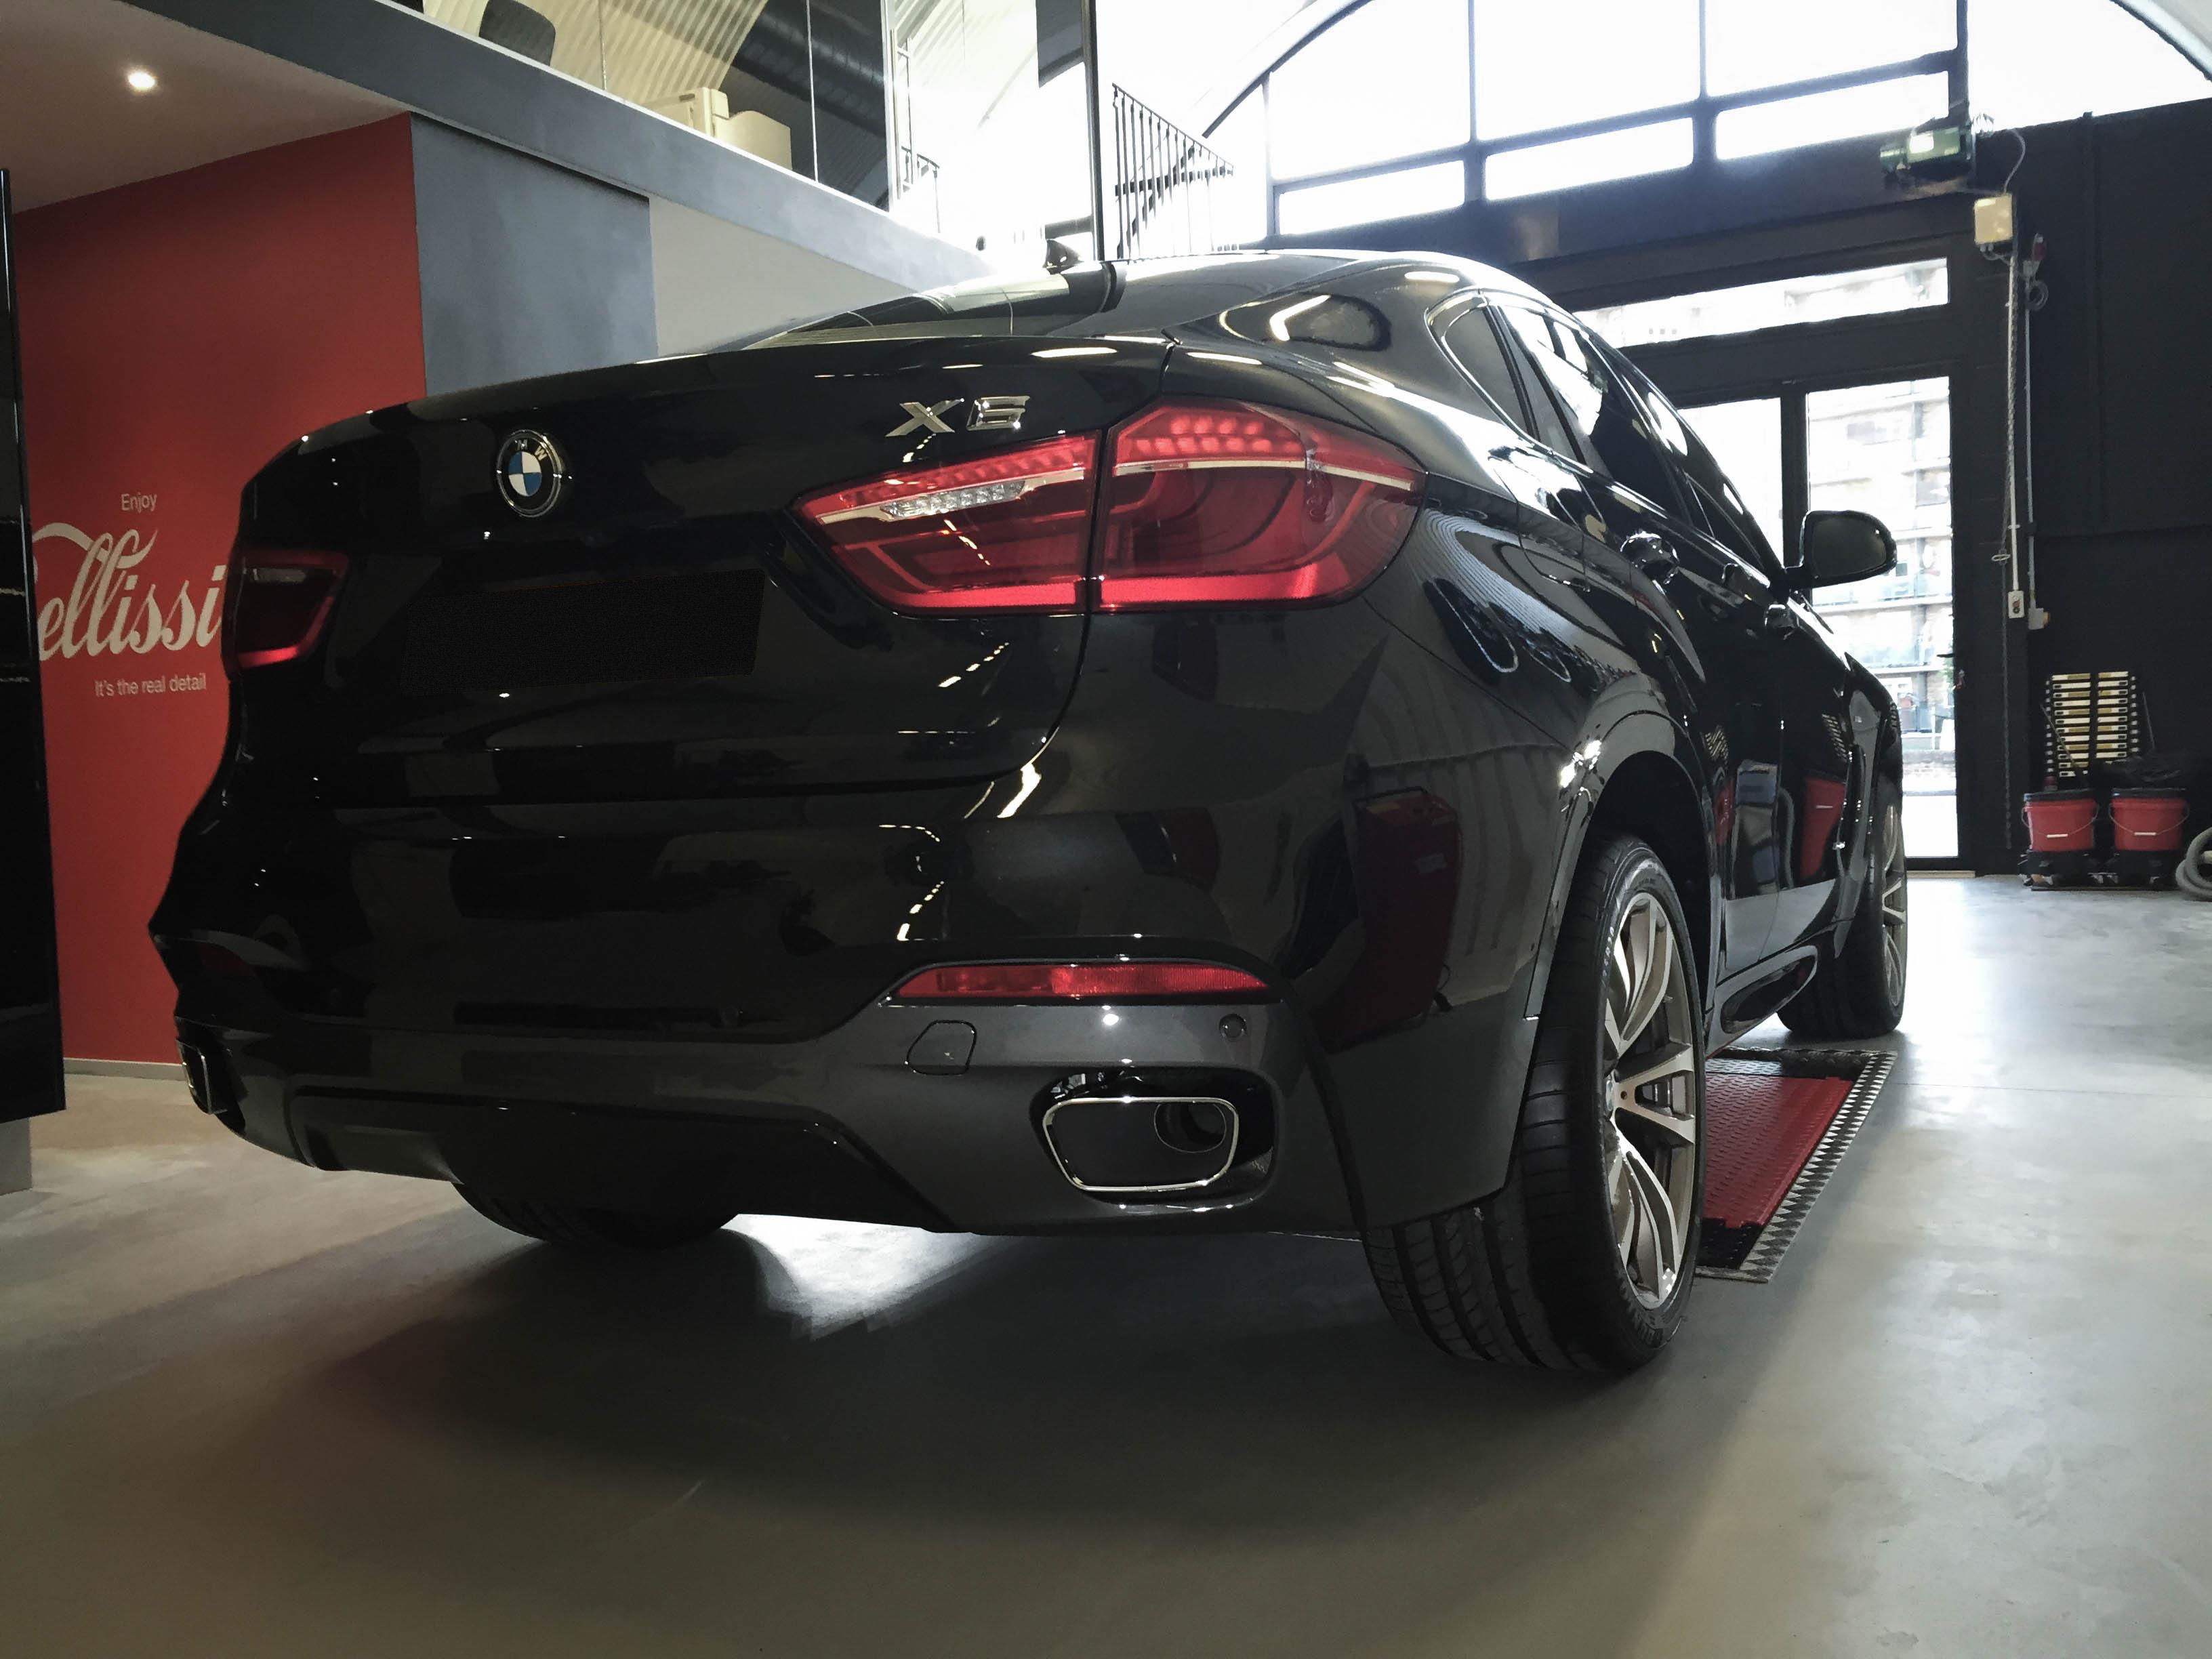 BMW X6 –Rear